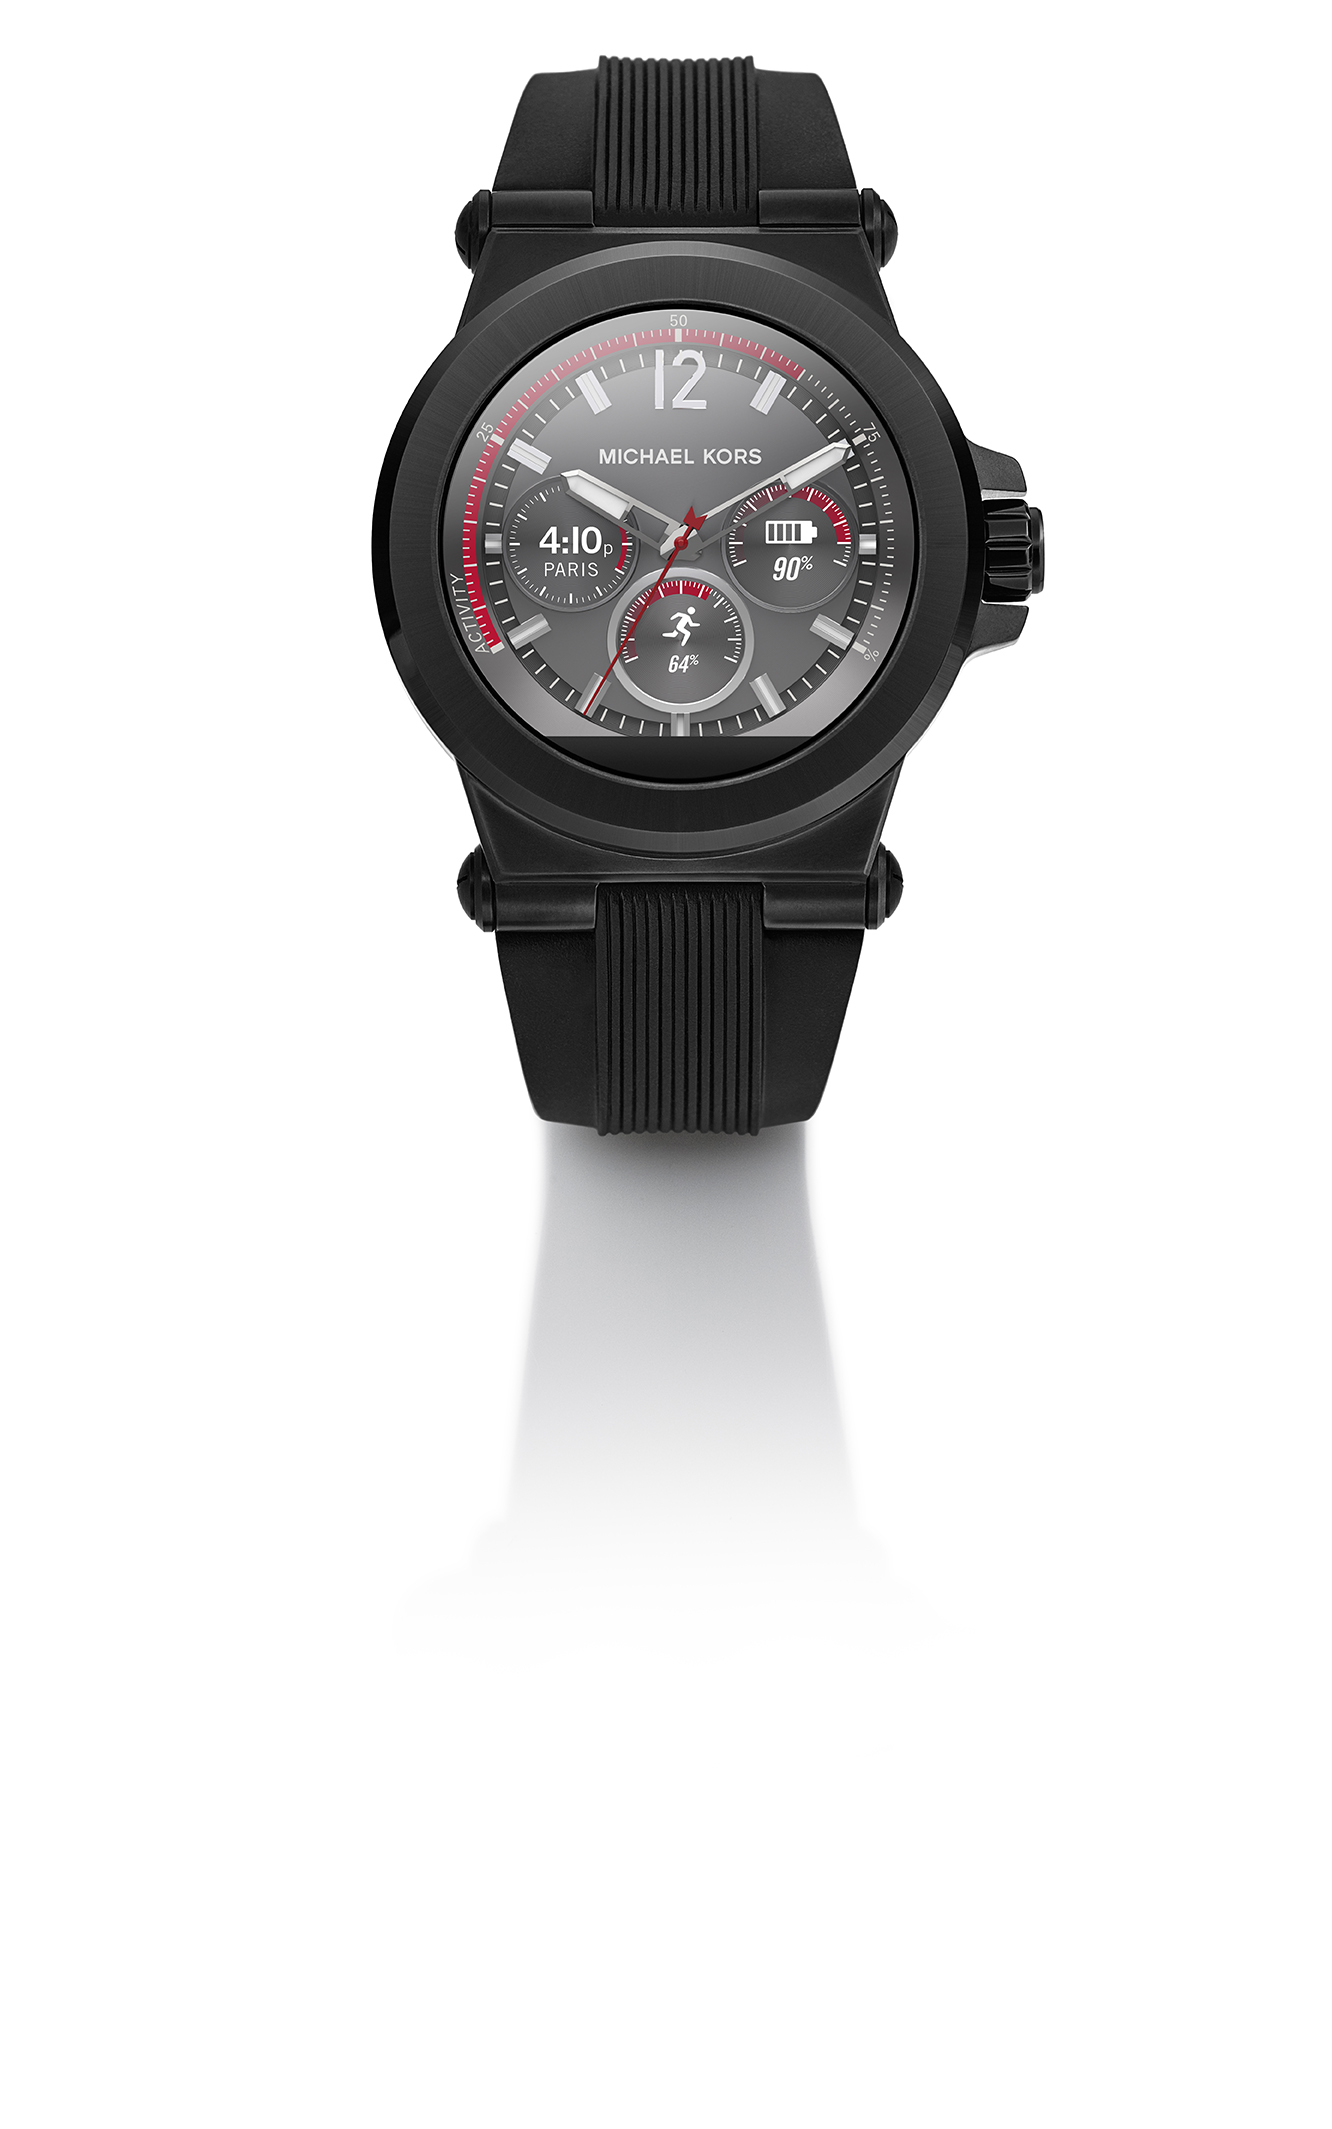 MICHAEL KORS ACCESS Smartwatch (Photo: Business Wire)